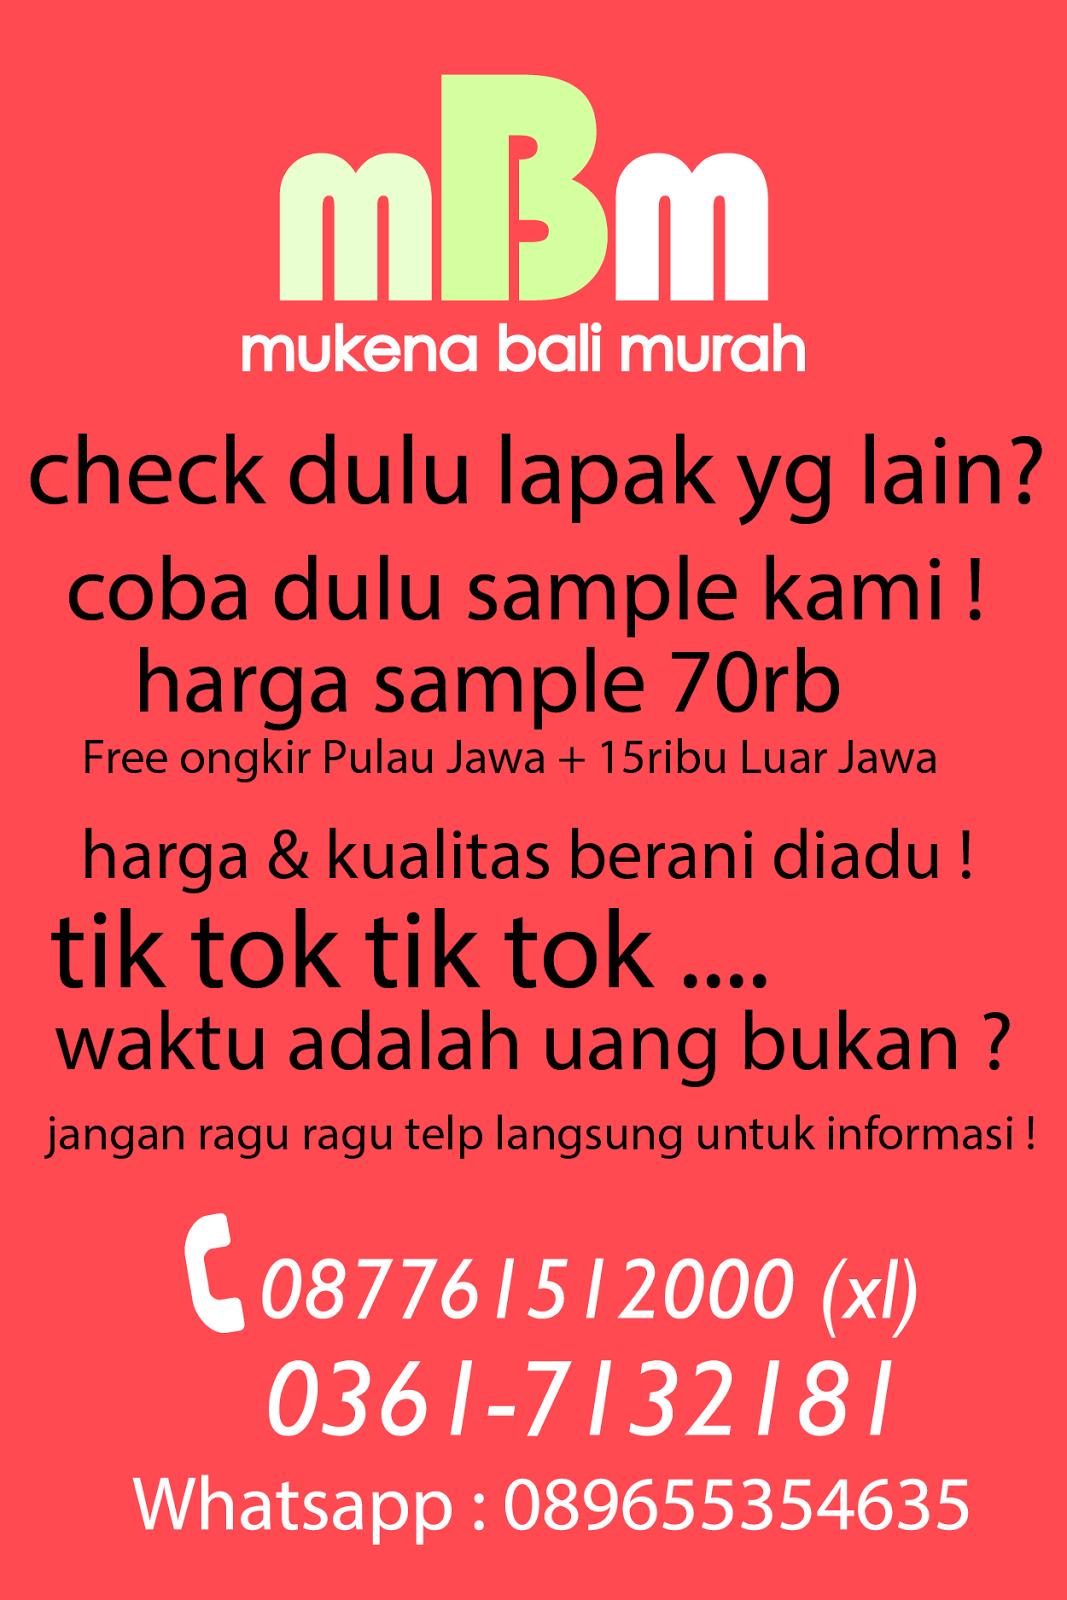 http://mukenabalihargagrosir.blogspot.com/